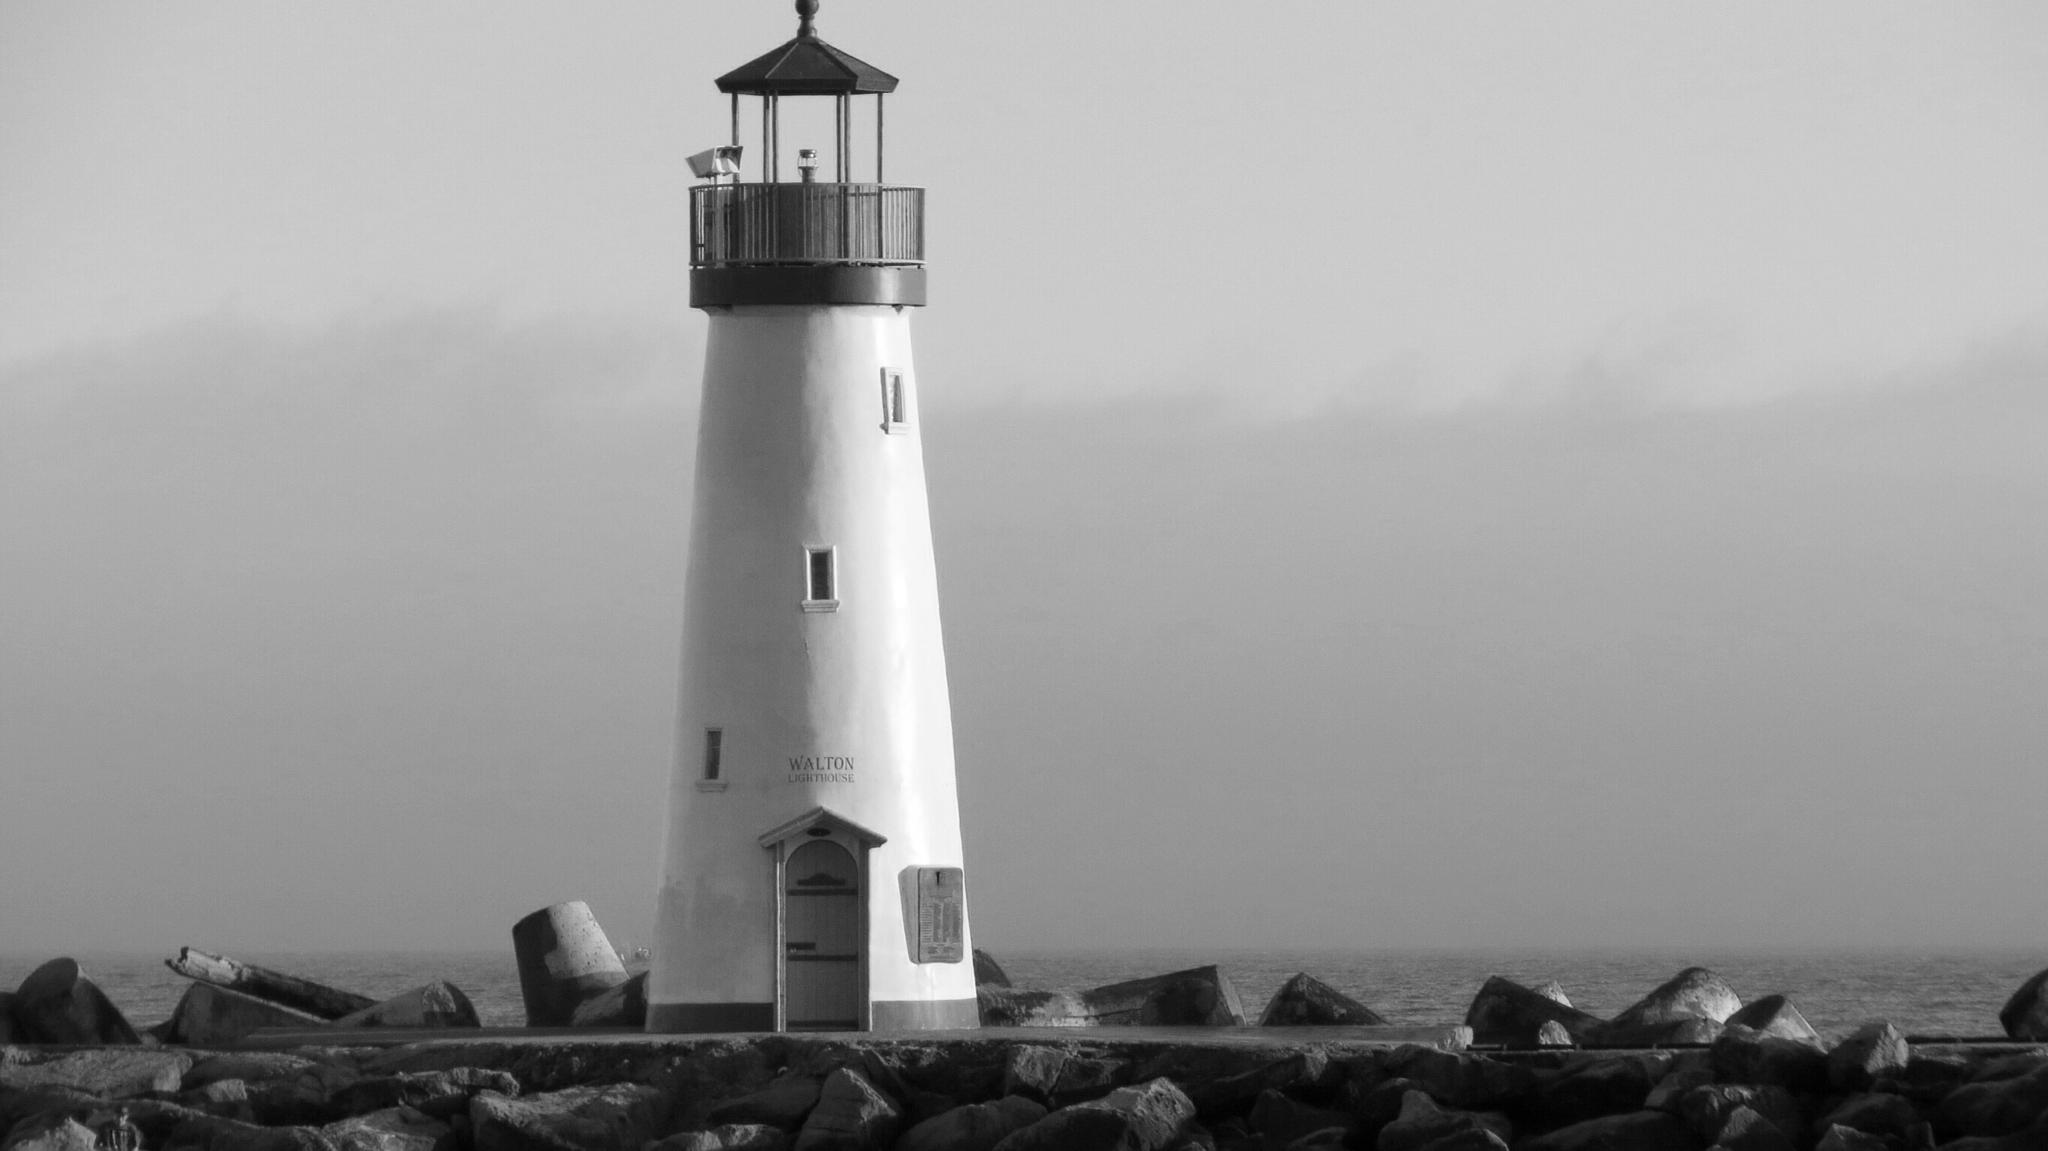 Walton Lighthouse - Santa Cruz CA by soulofcentralcoast